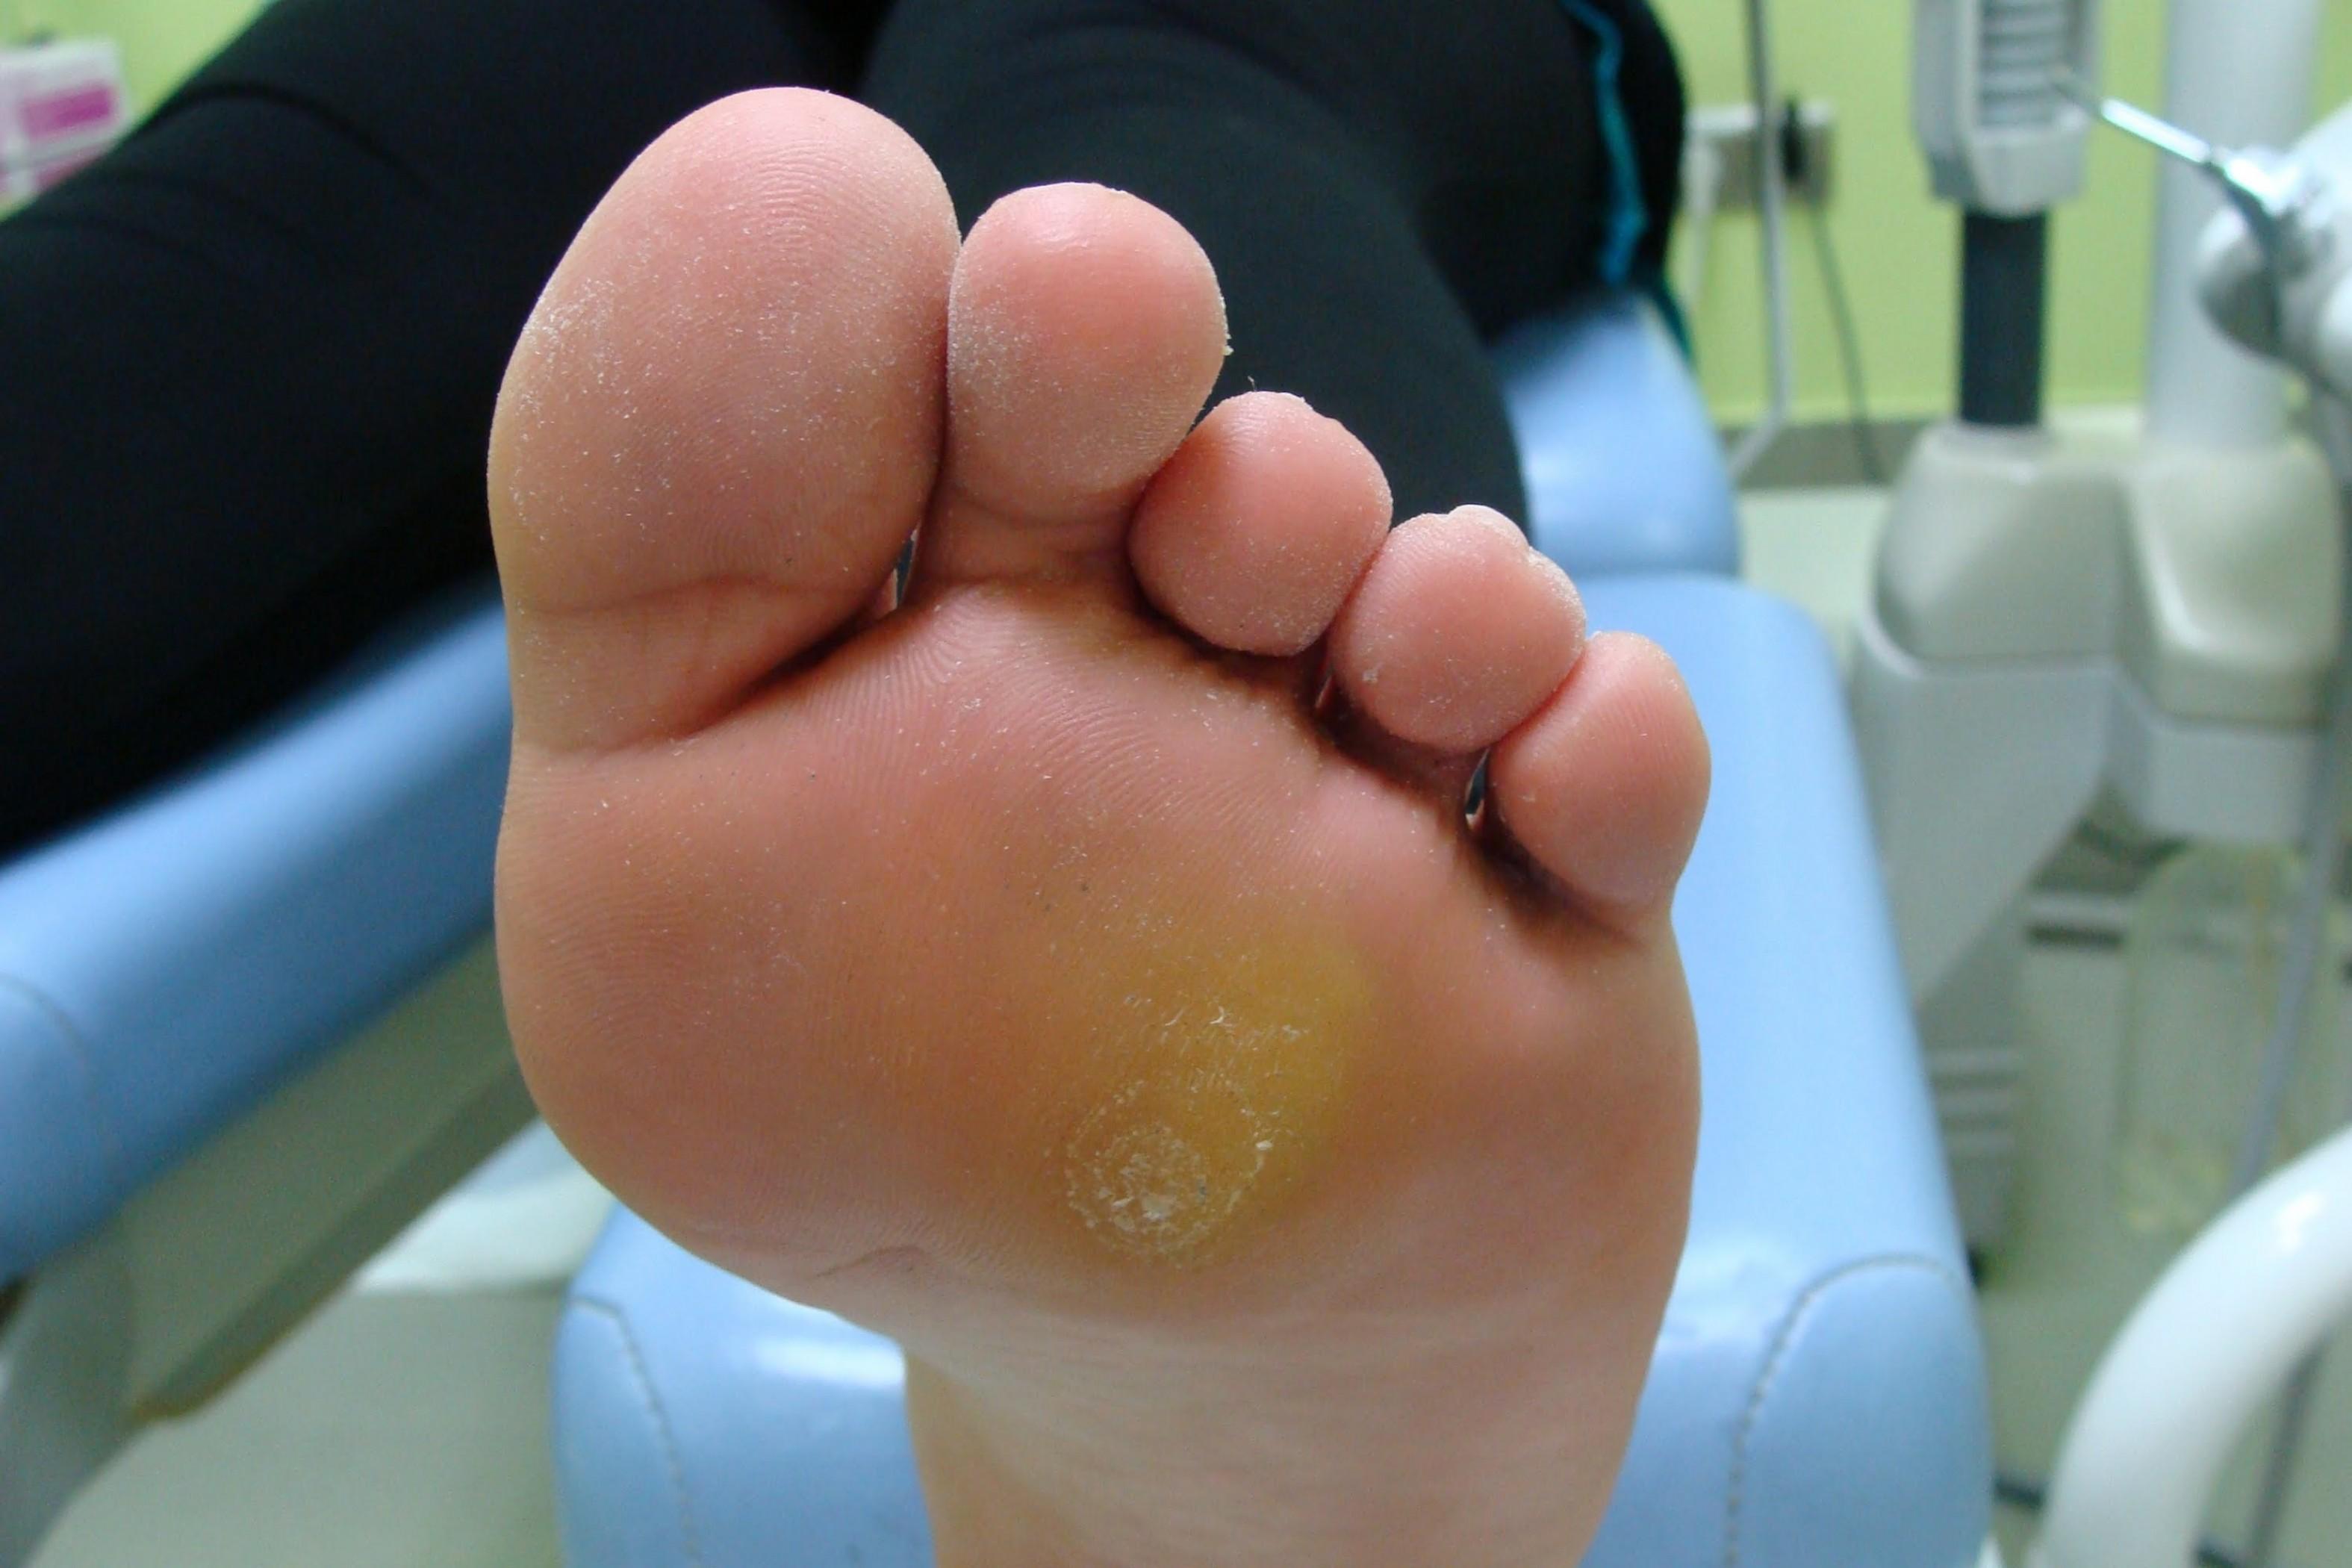 Натоптыши со стержнем: лечение фармакологическими препаратами